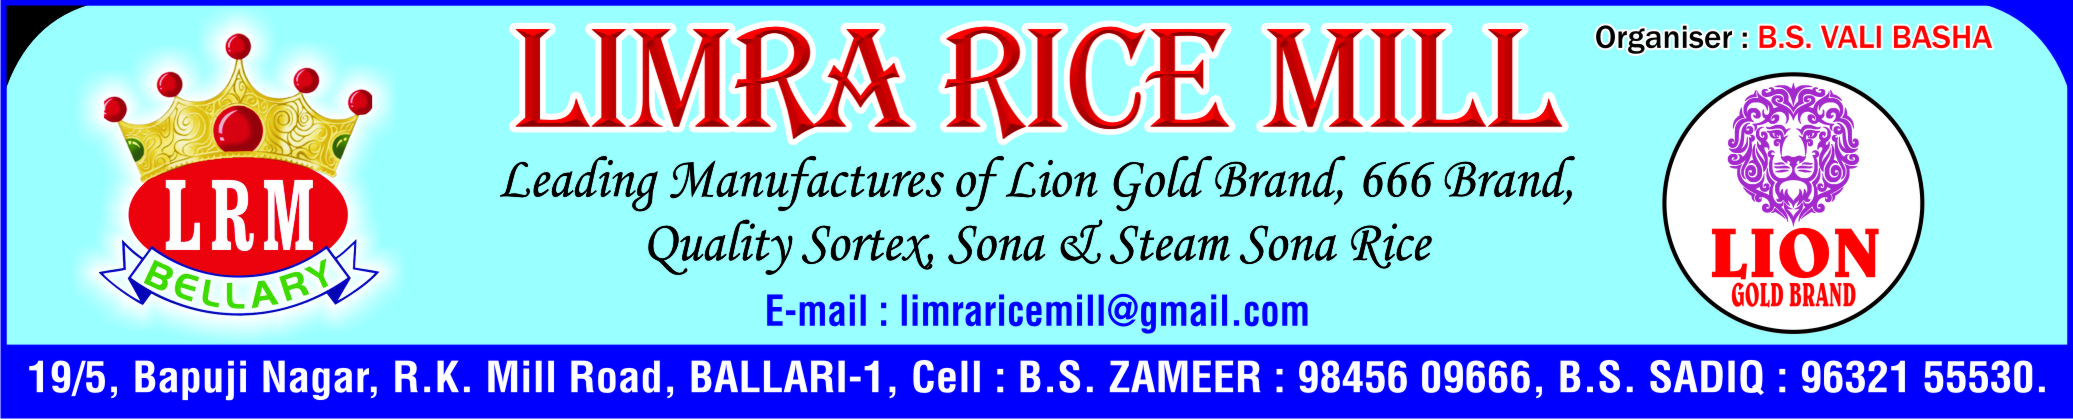 Limra Rice Mill